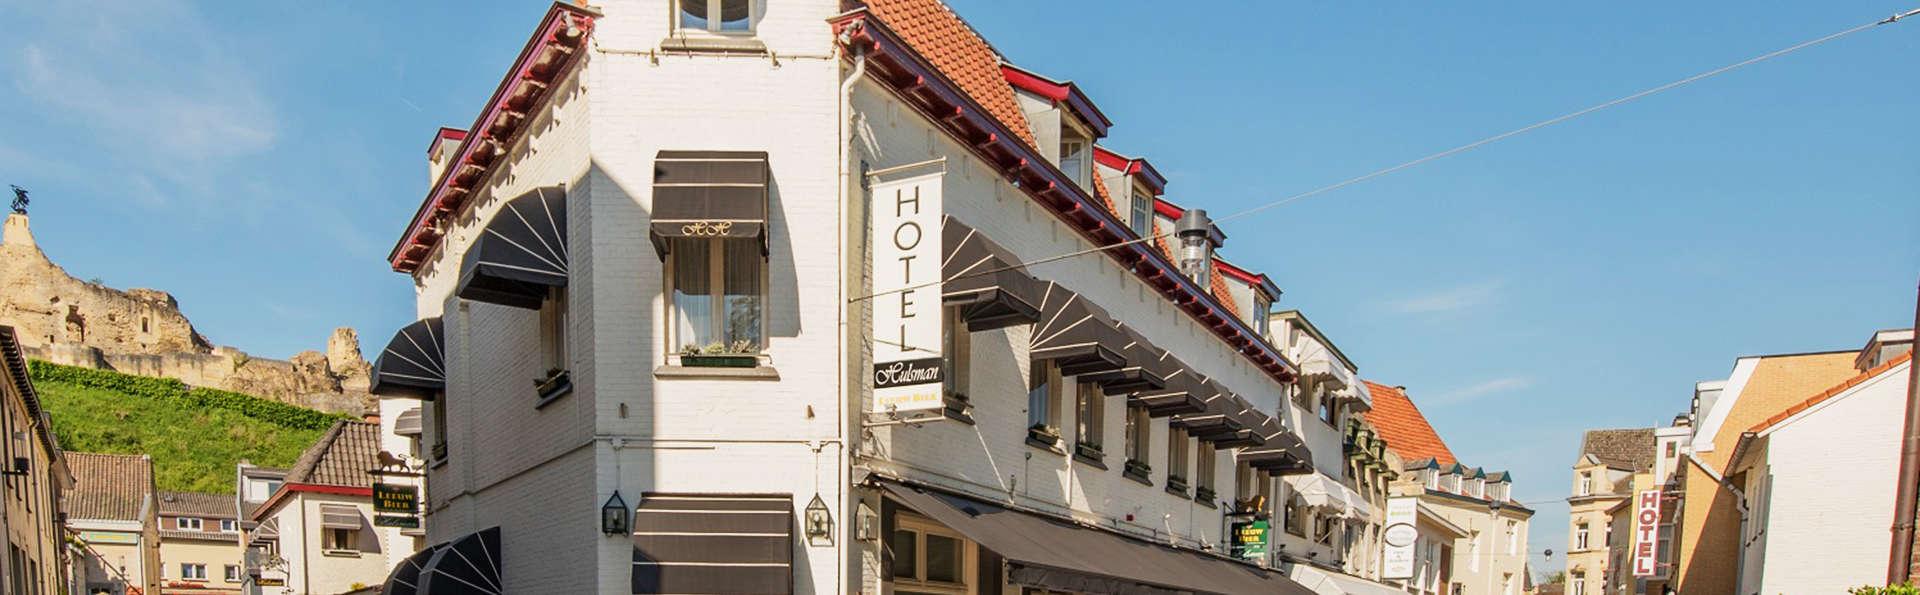 Hotel Hulsman - EDIT_front.jpg